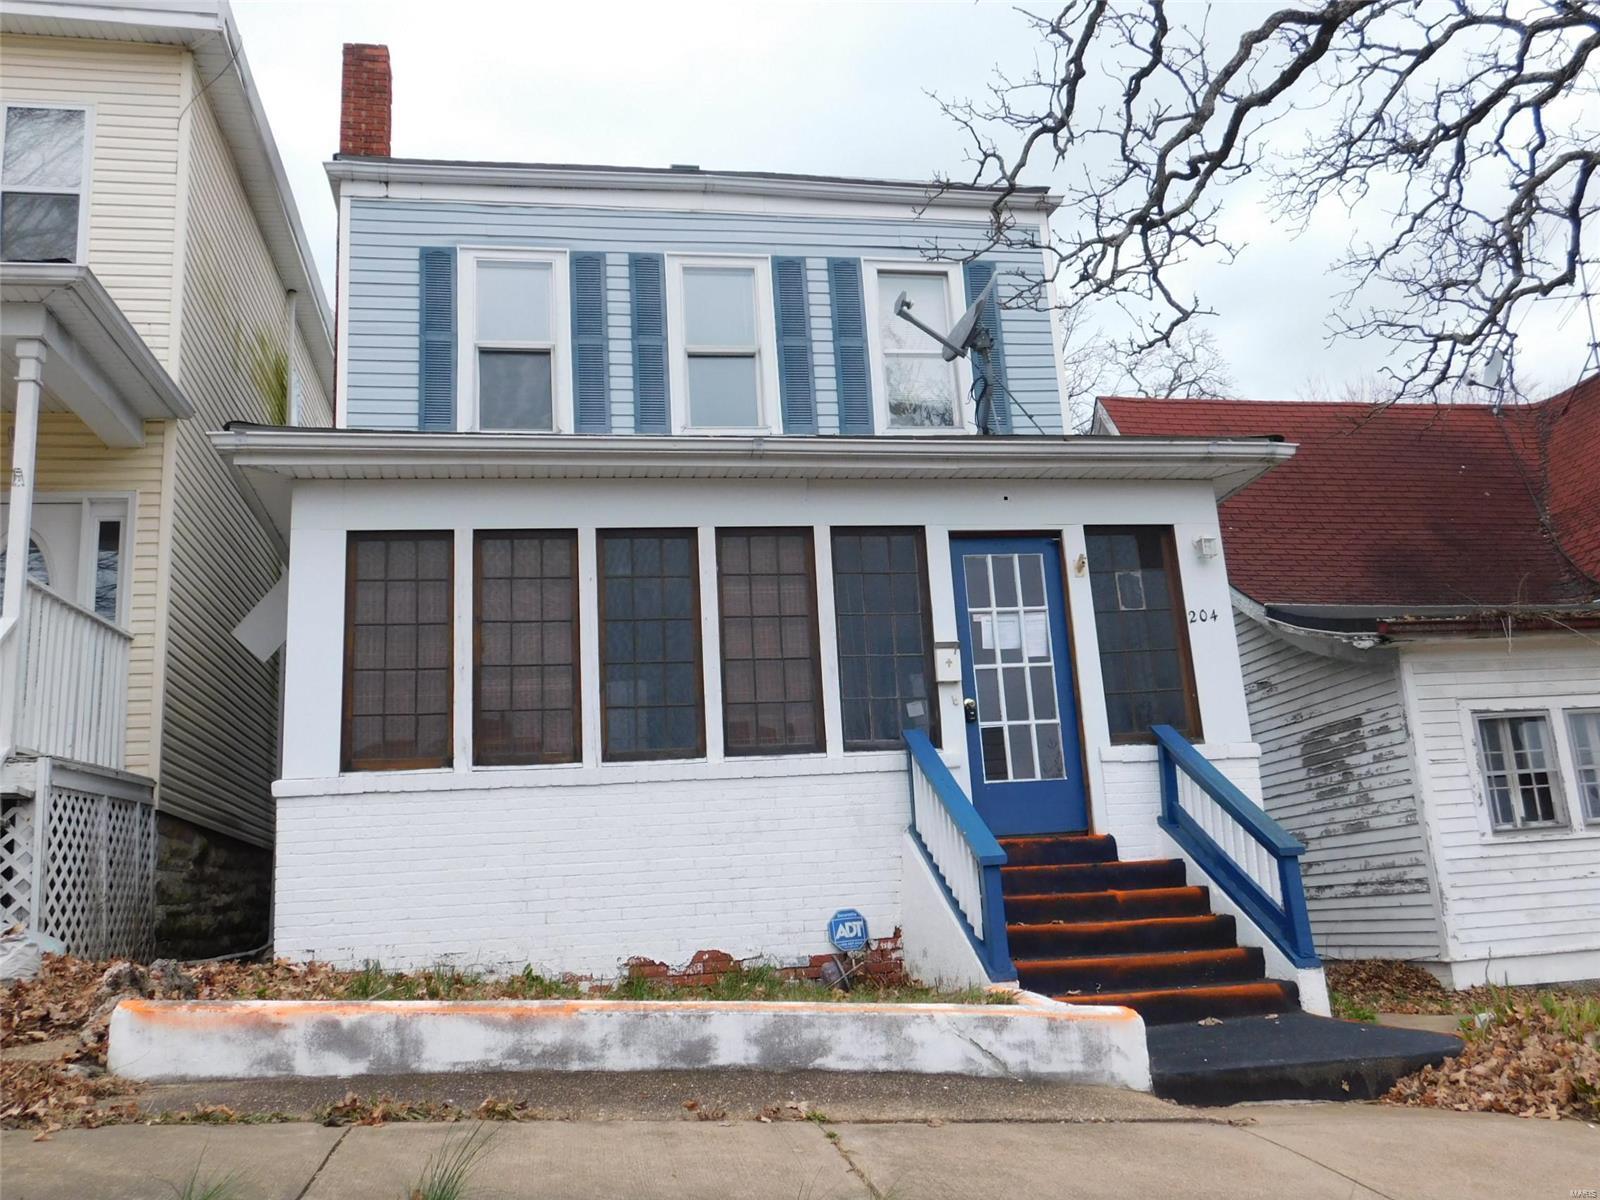 204 S 3rd Property Photo - De Soto, MO real estate listing